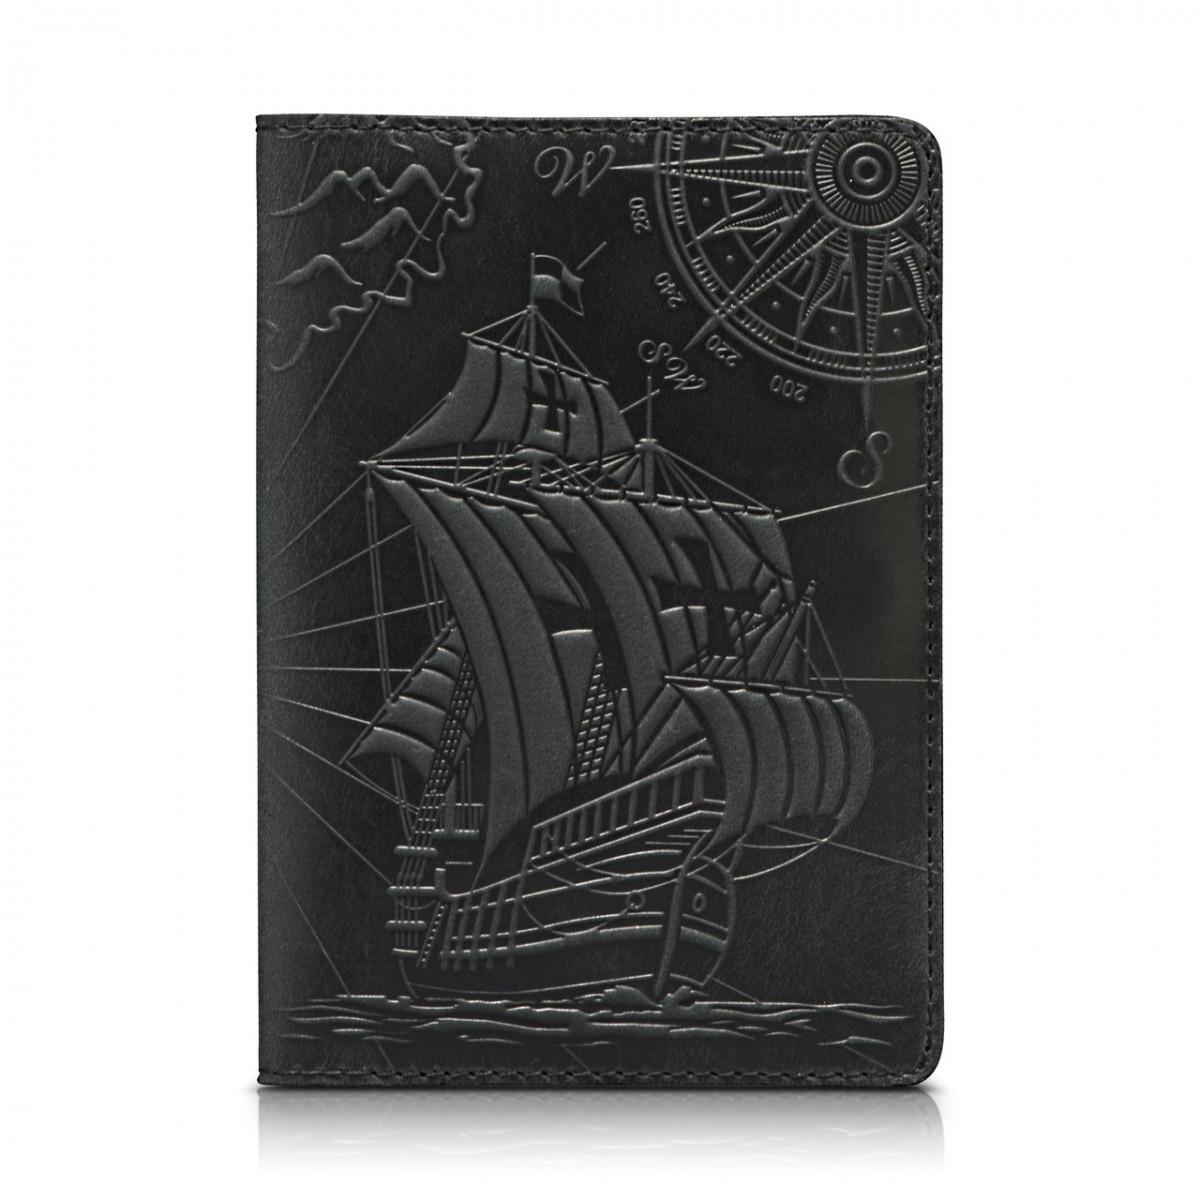 Обложка для паспорта HiArt Shabby Night Discoveries